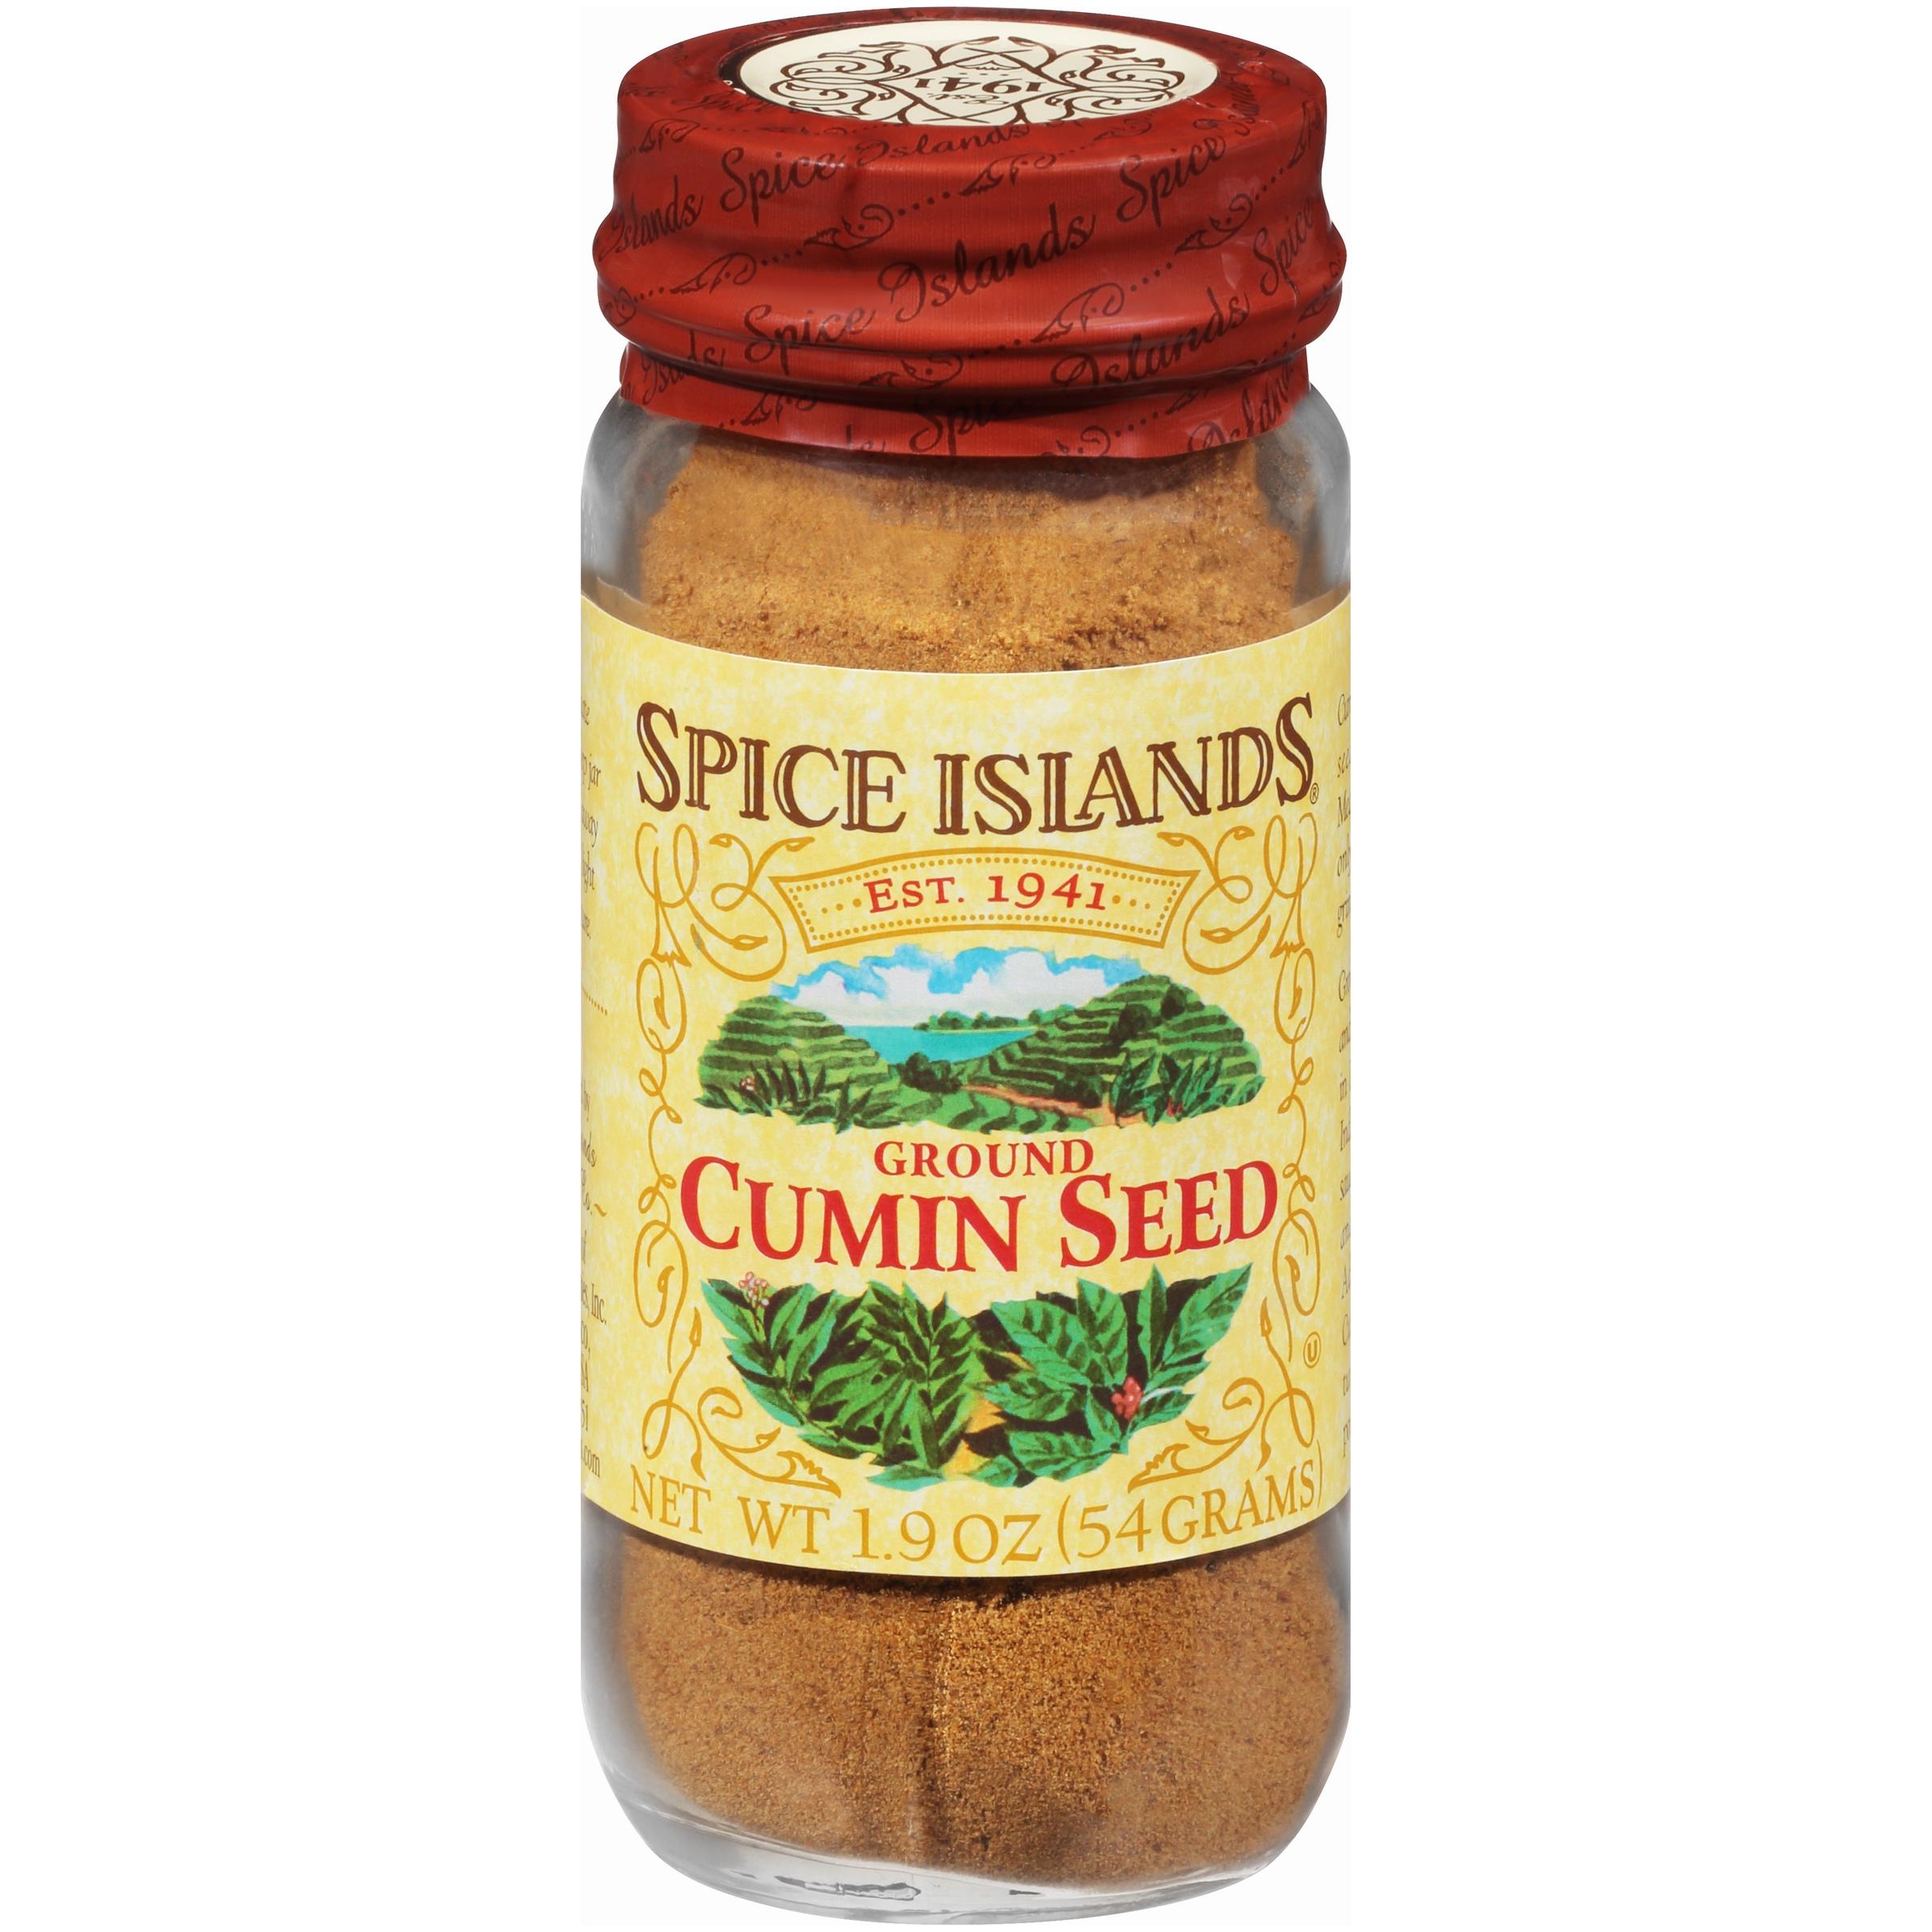 Spice Islands® Ground Cumin Seed 1.9 oz. Jar